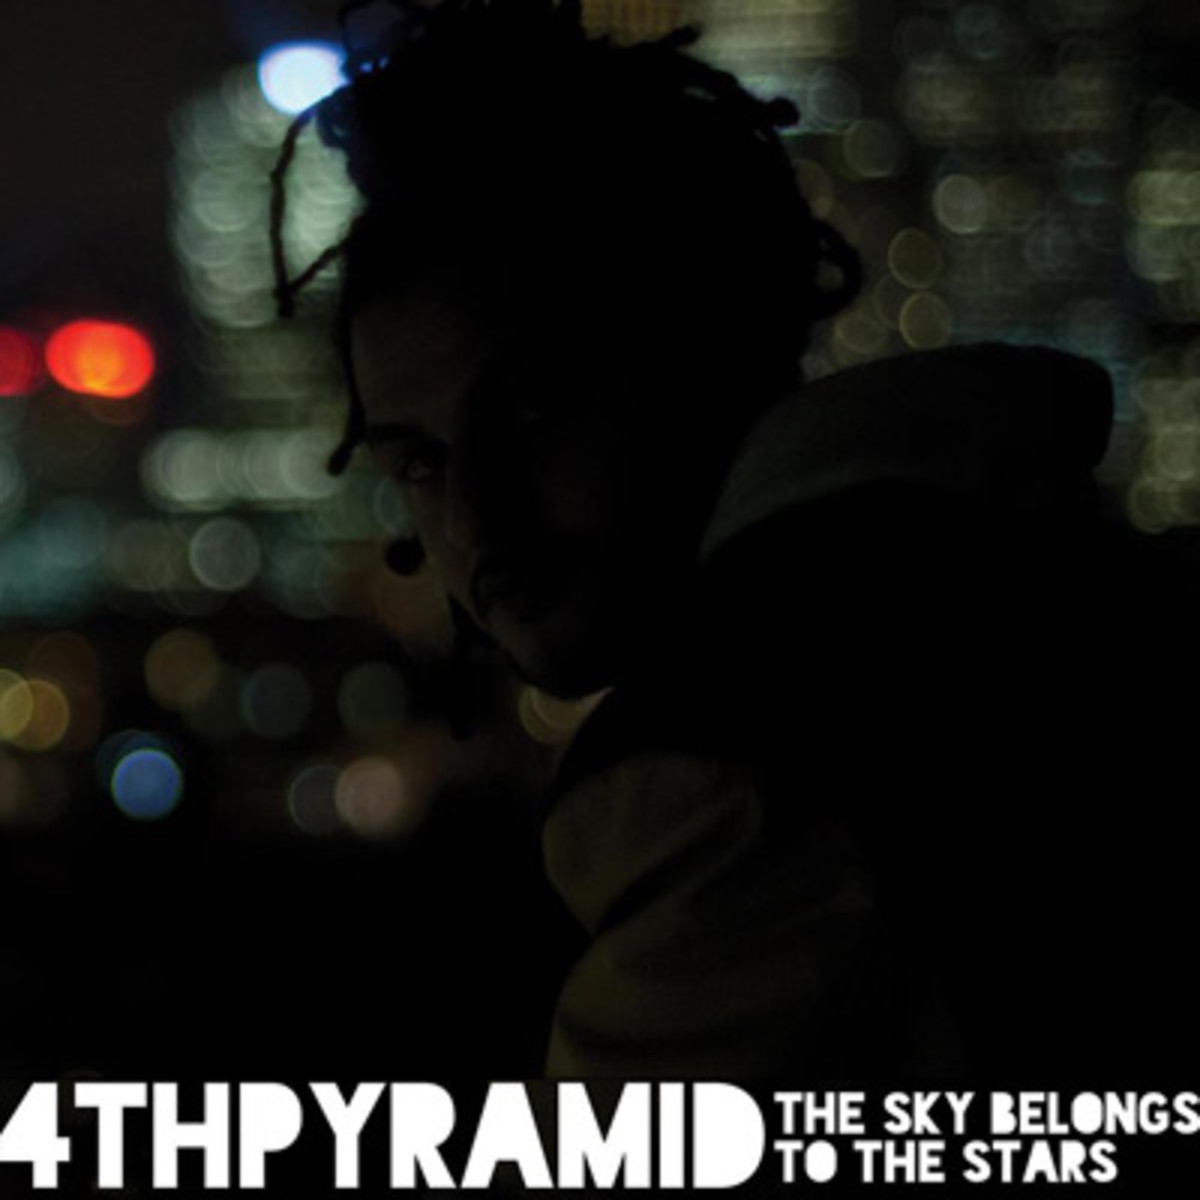 4thpyramid-skybelongs2thestars.jpg